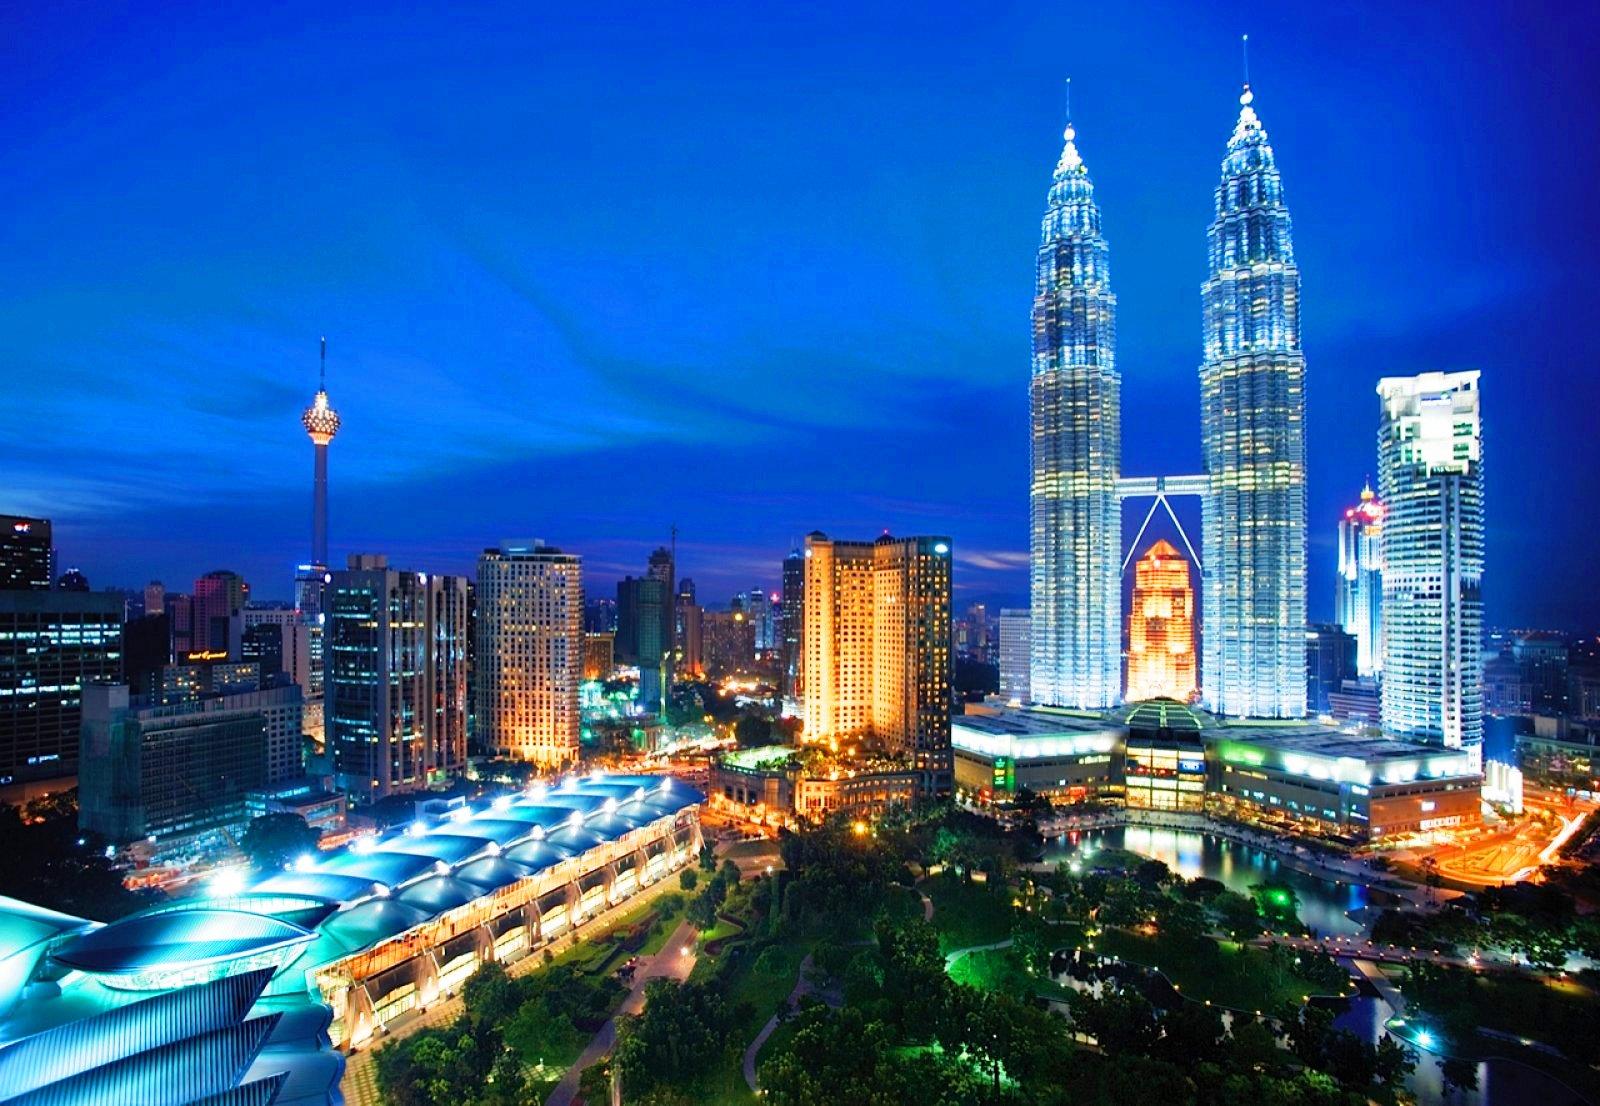 Kuala Lumpur Beautiful Hd Wallpapers: Kuala Lumpur Wallpaper Gallery